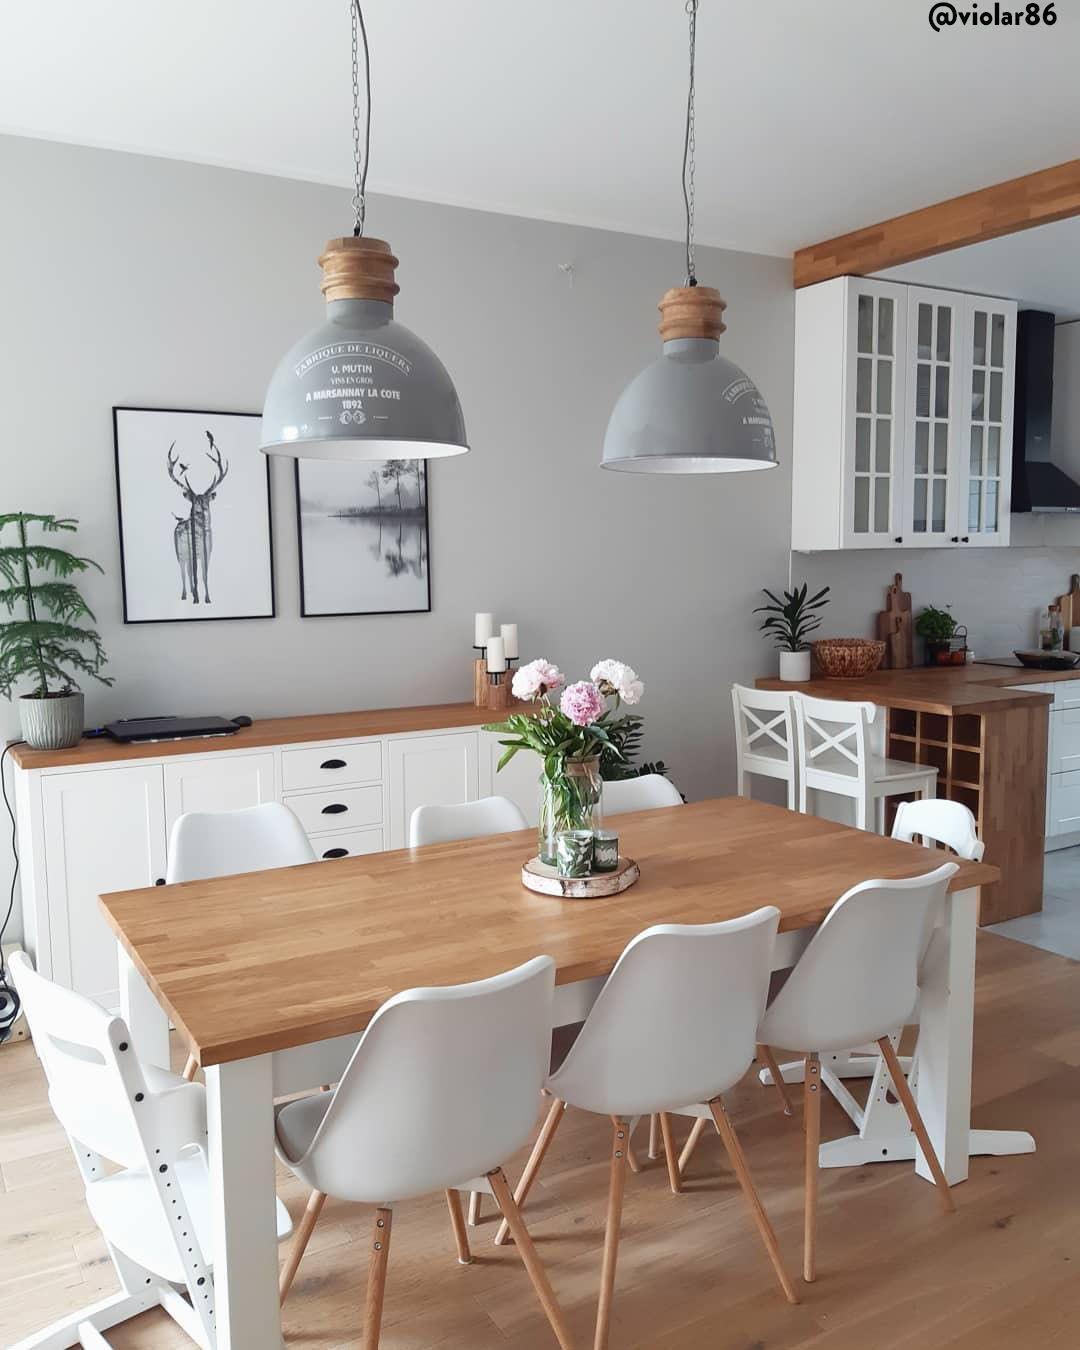 Crea anche tu una sala da pranzo in stile scandi rustico ...